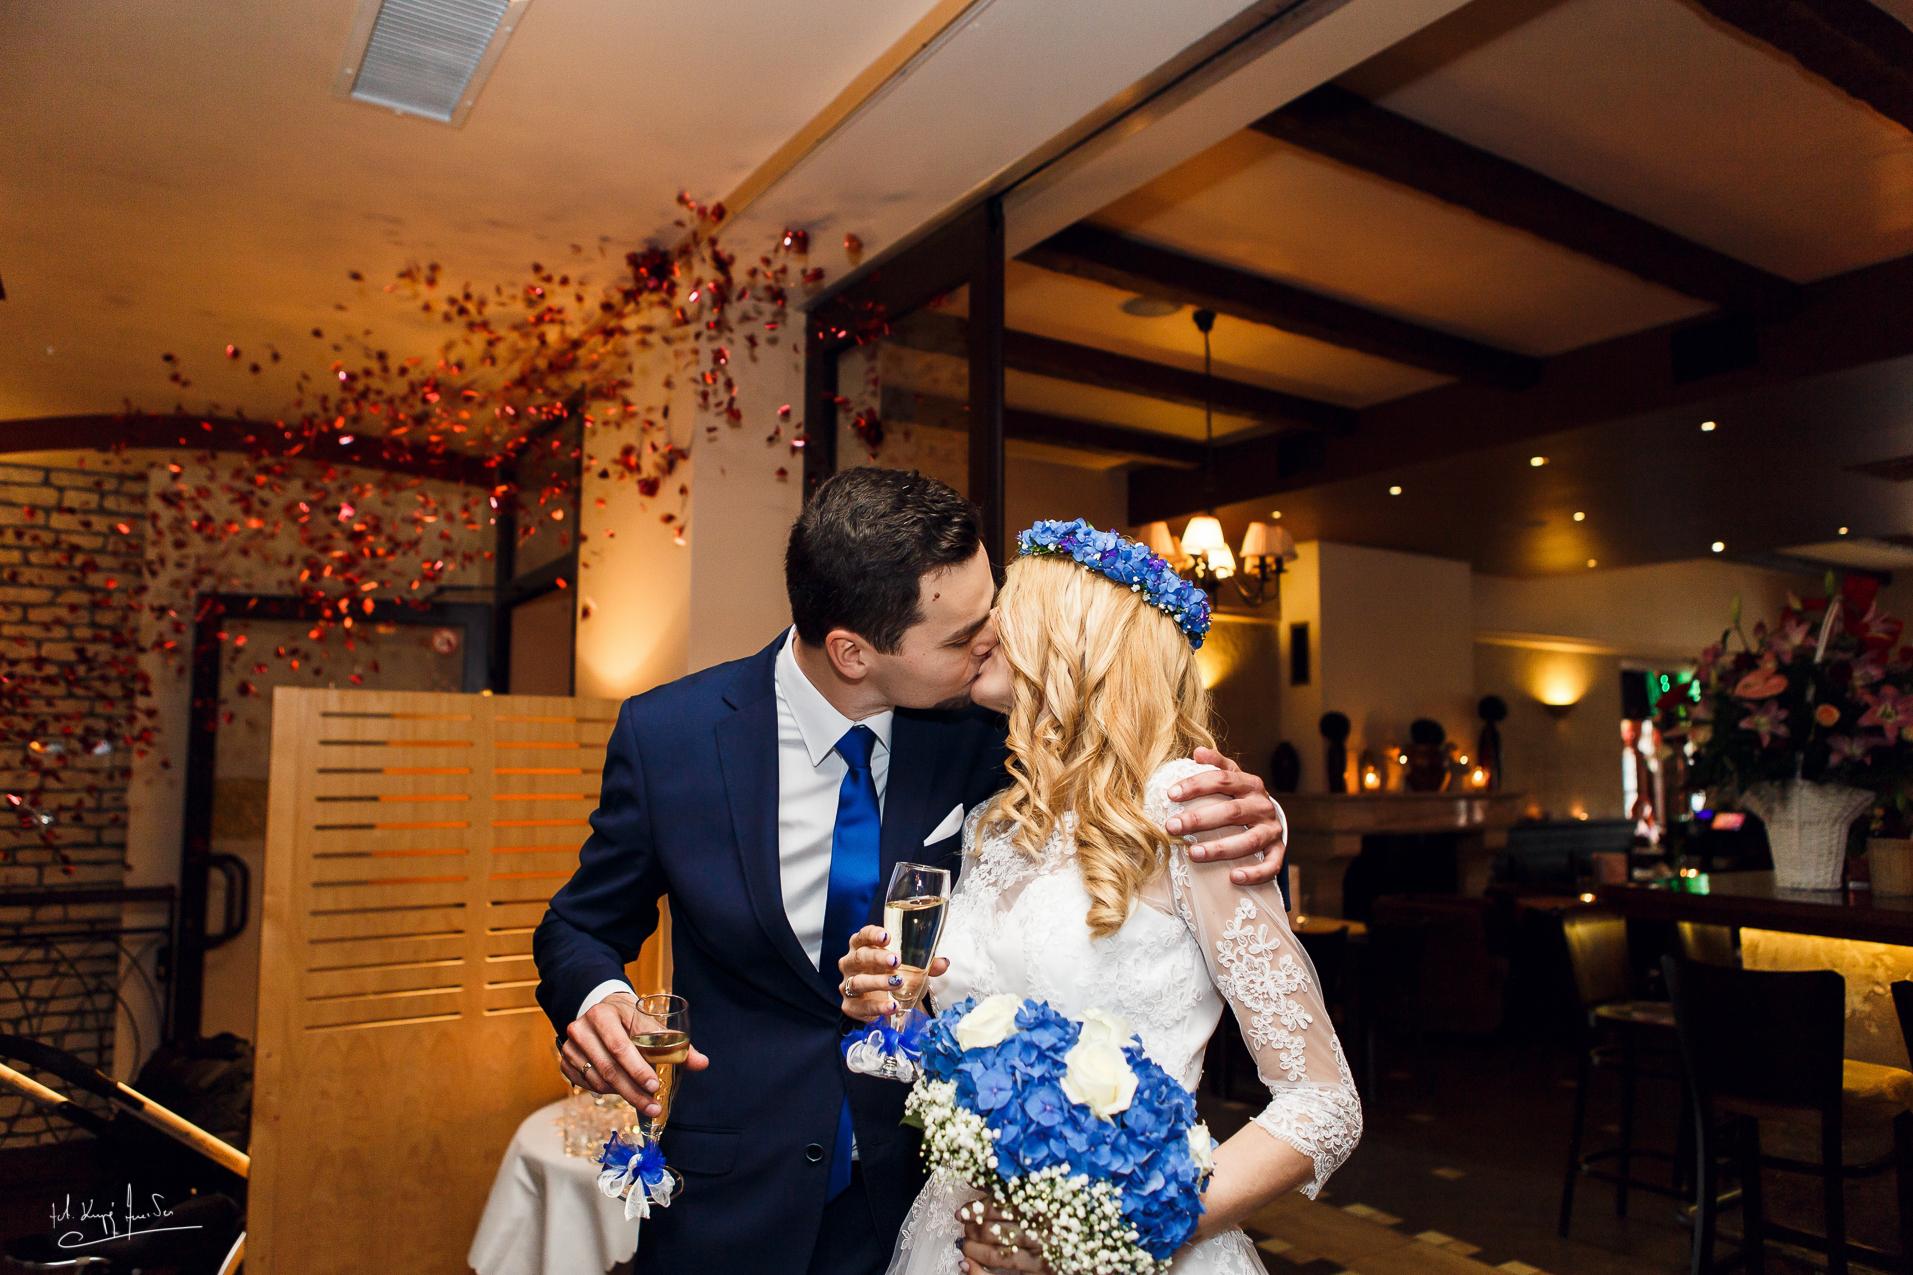 Ślub wesele szklarska poręba 32 Marta & Sławek